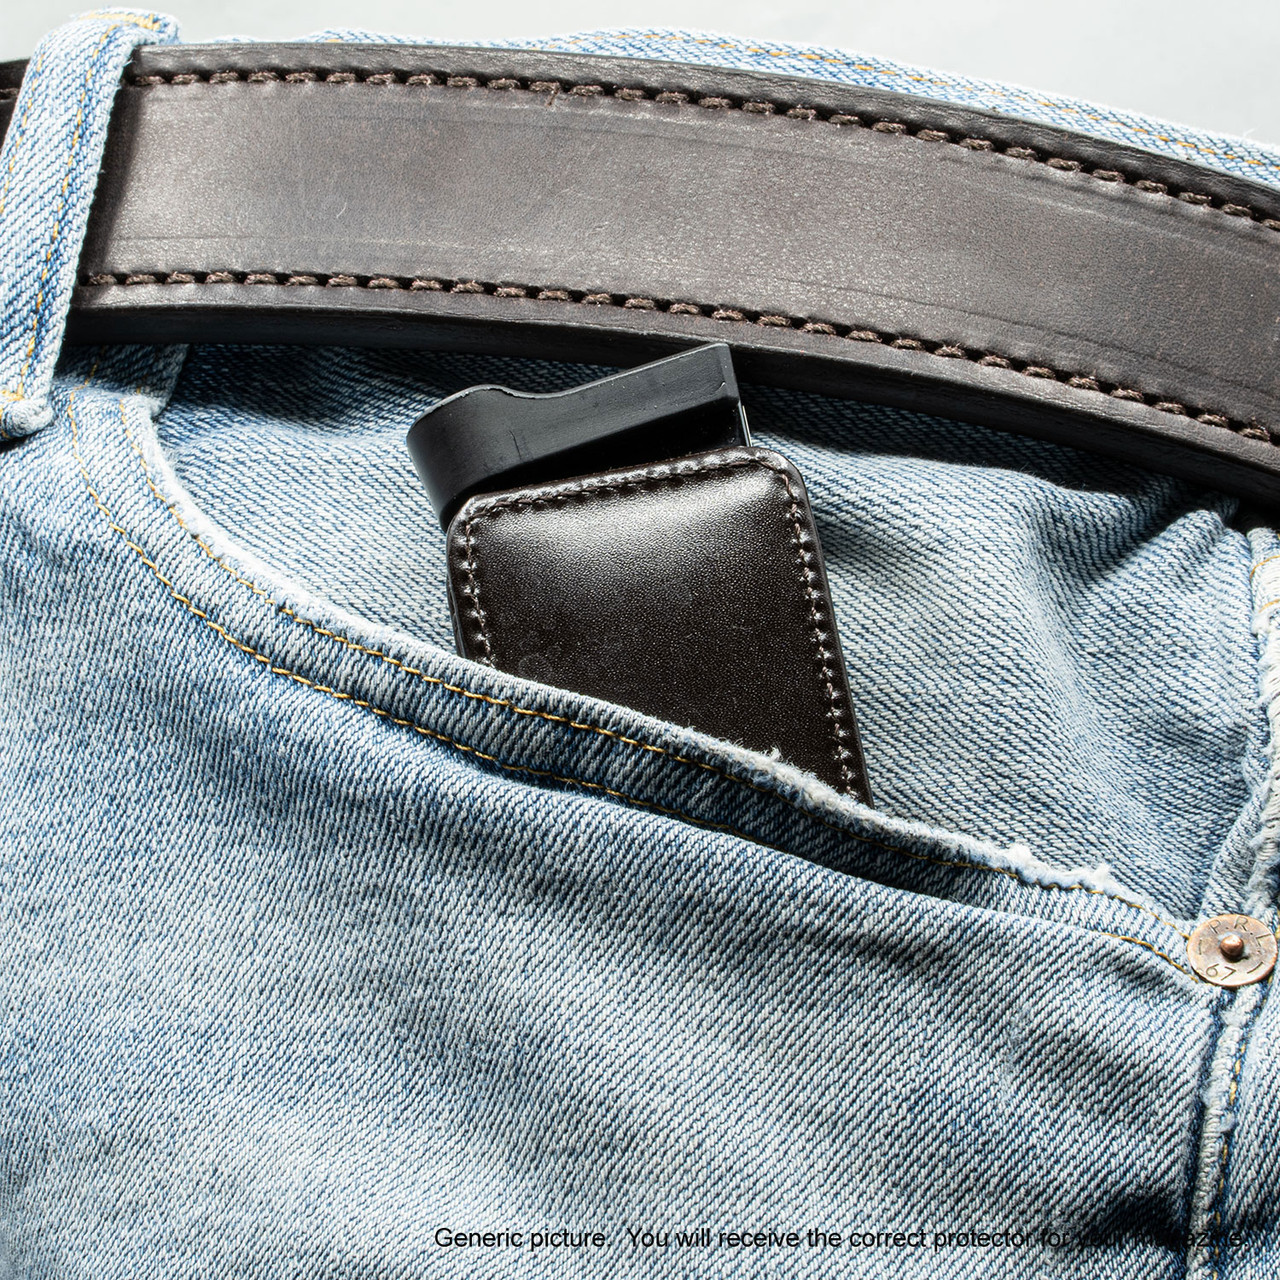 Taurus Millennium Pro 140 Brown Leather Magazine Pocket Protector